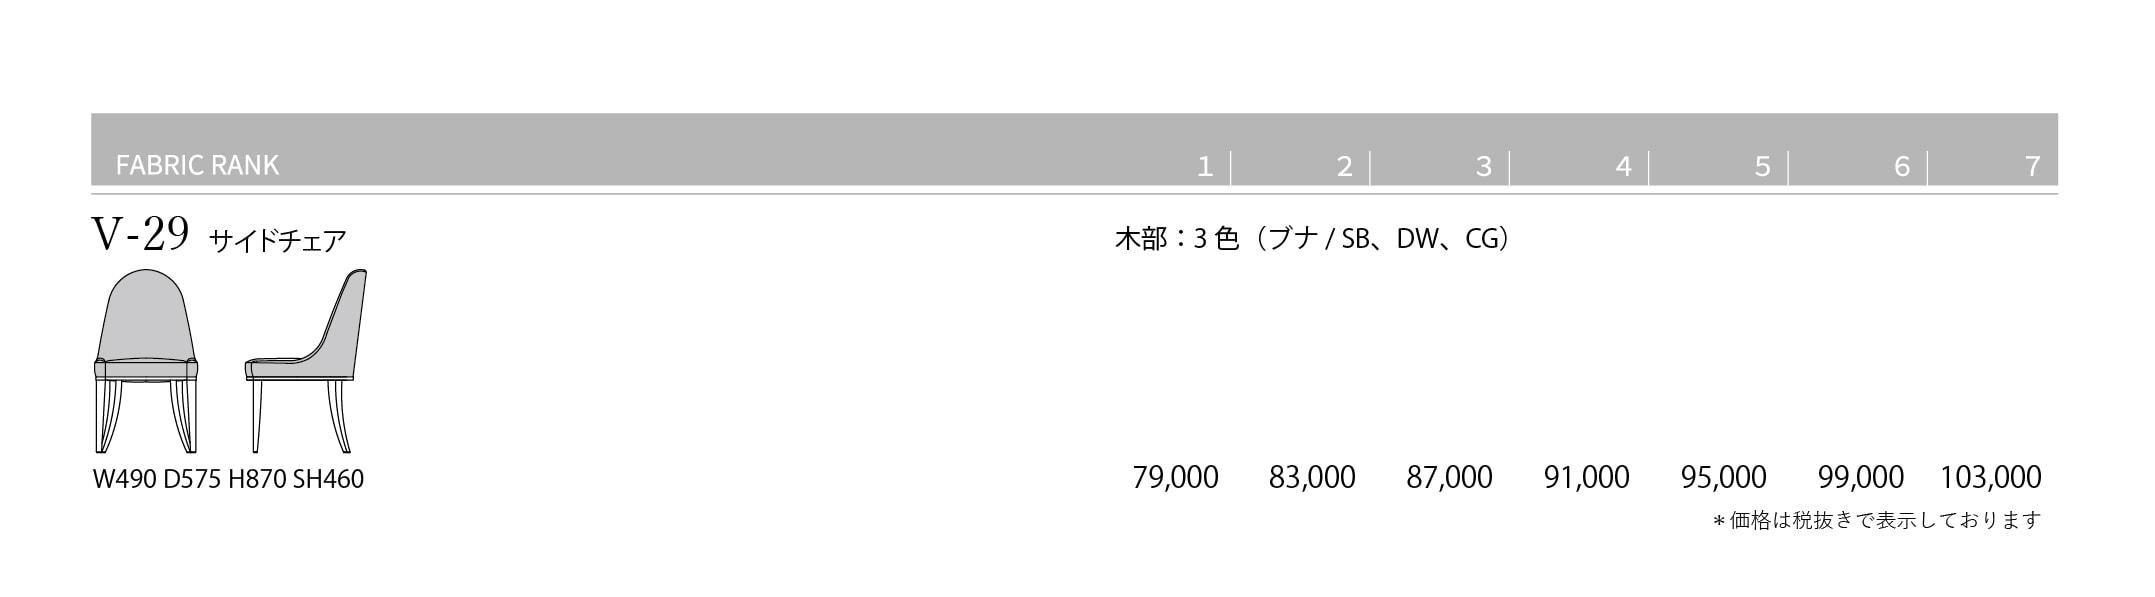 V-29 Price List